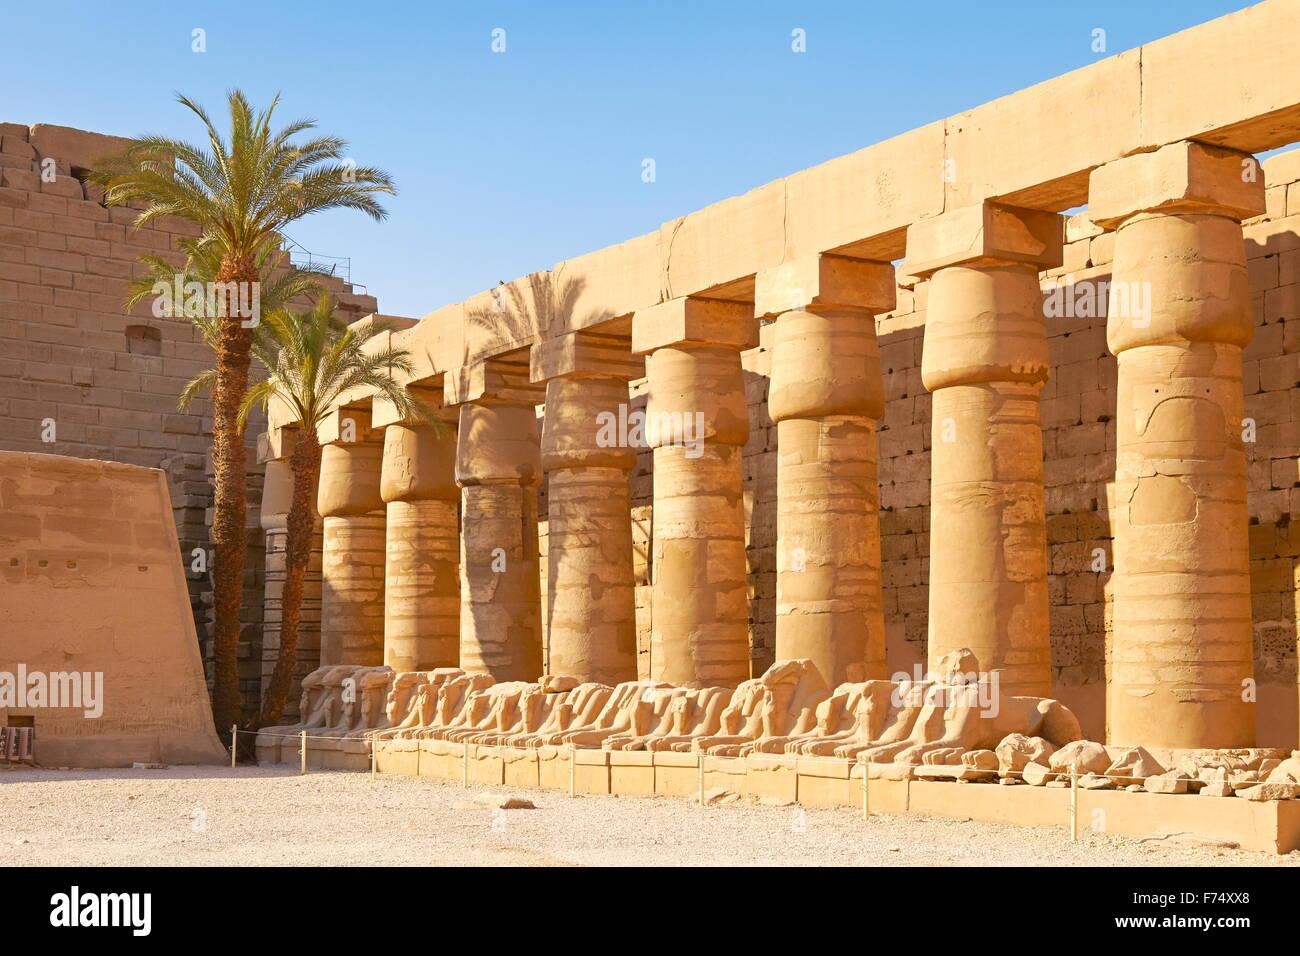 Egypte - Temple de Karnak Photo Stock